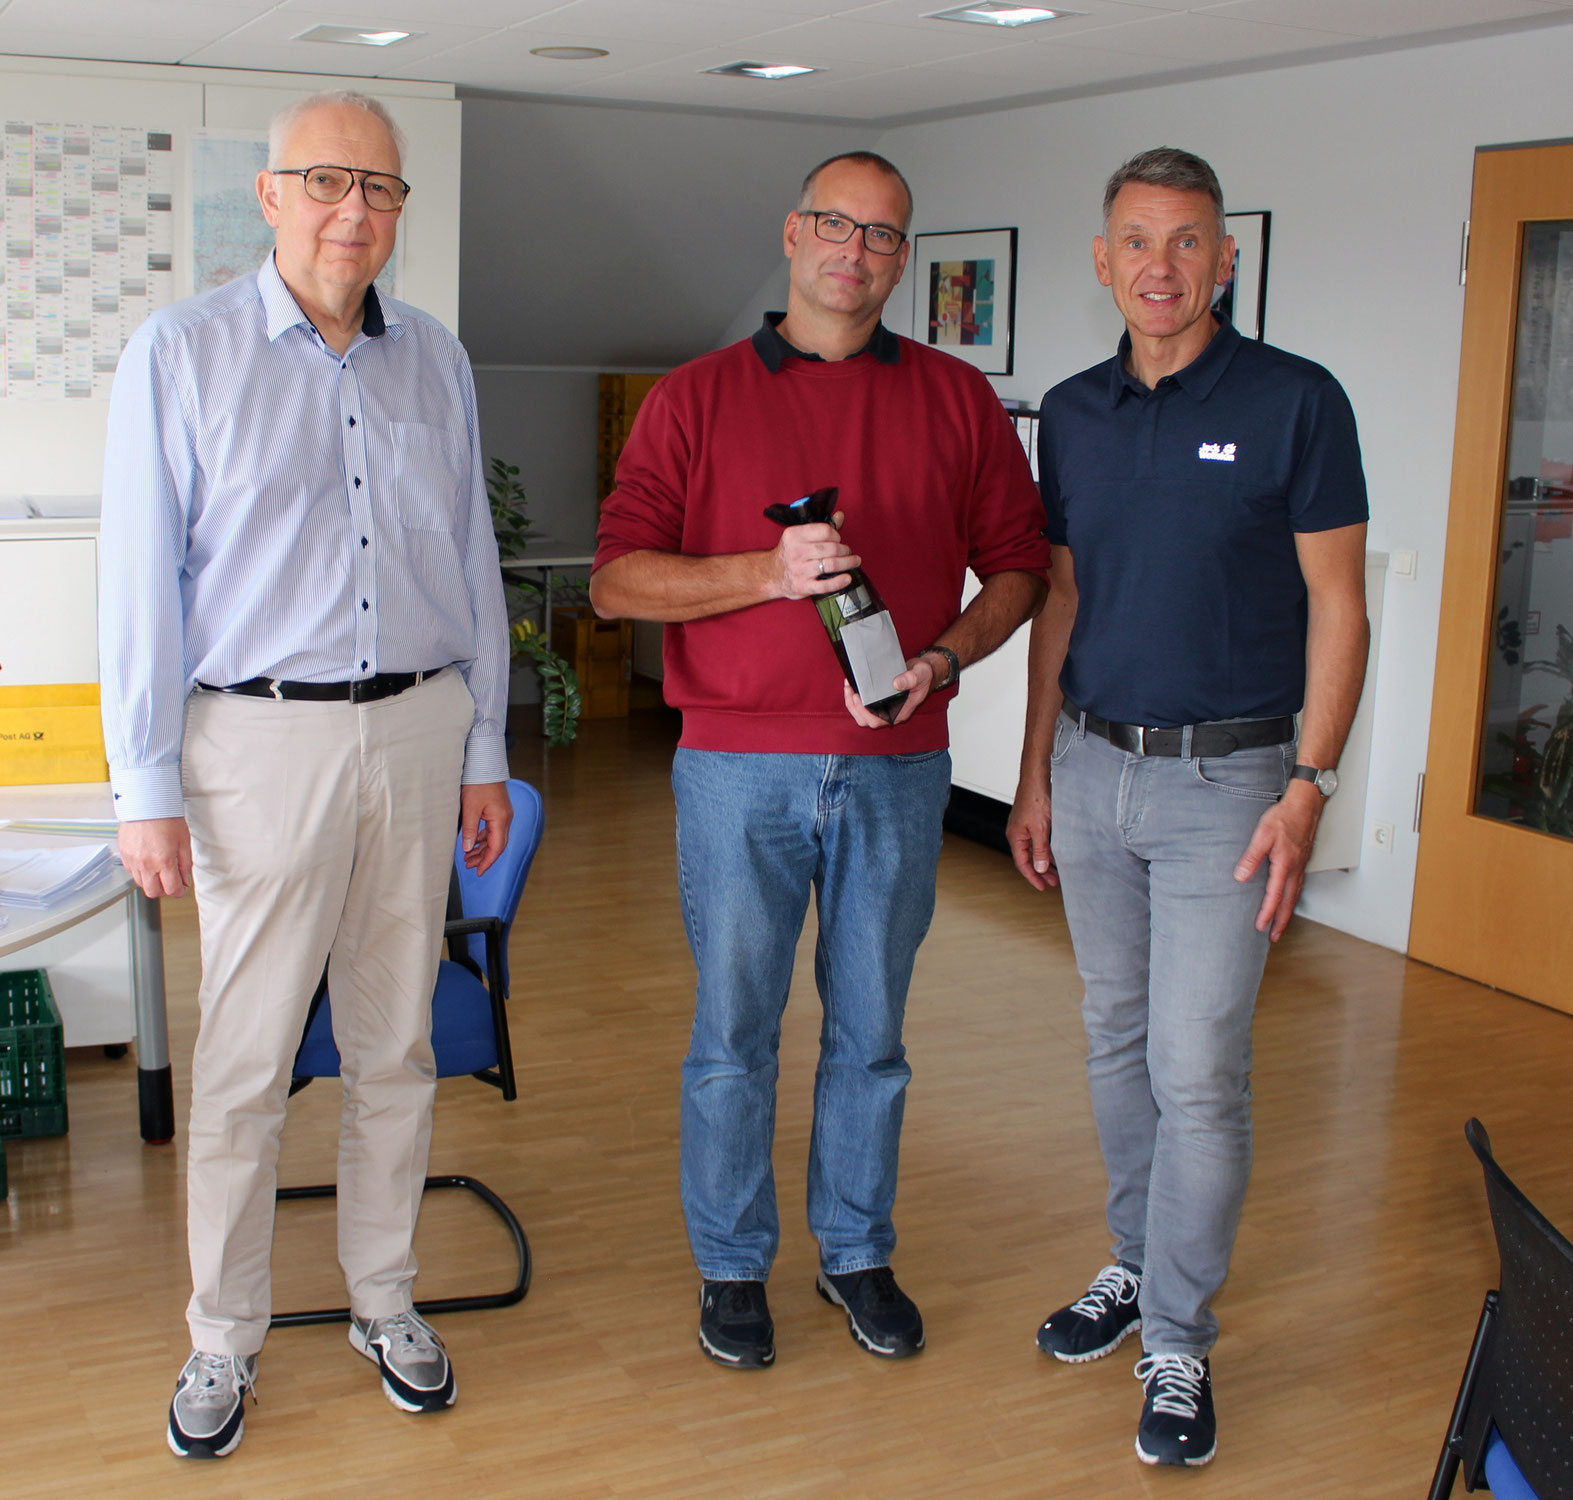 Holzfachschul-Dozent Carsten Fritzsching 50 Jahre jung